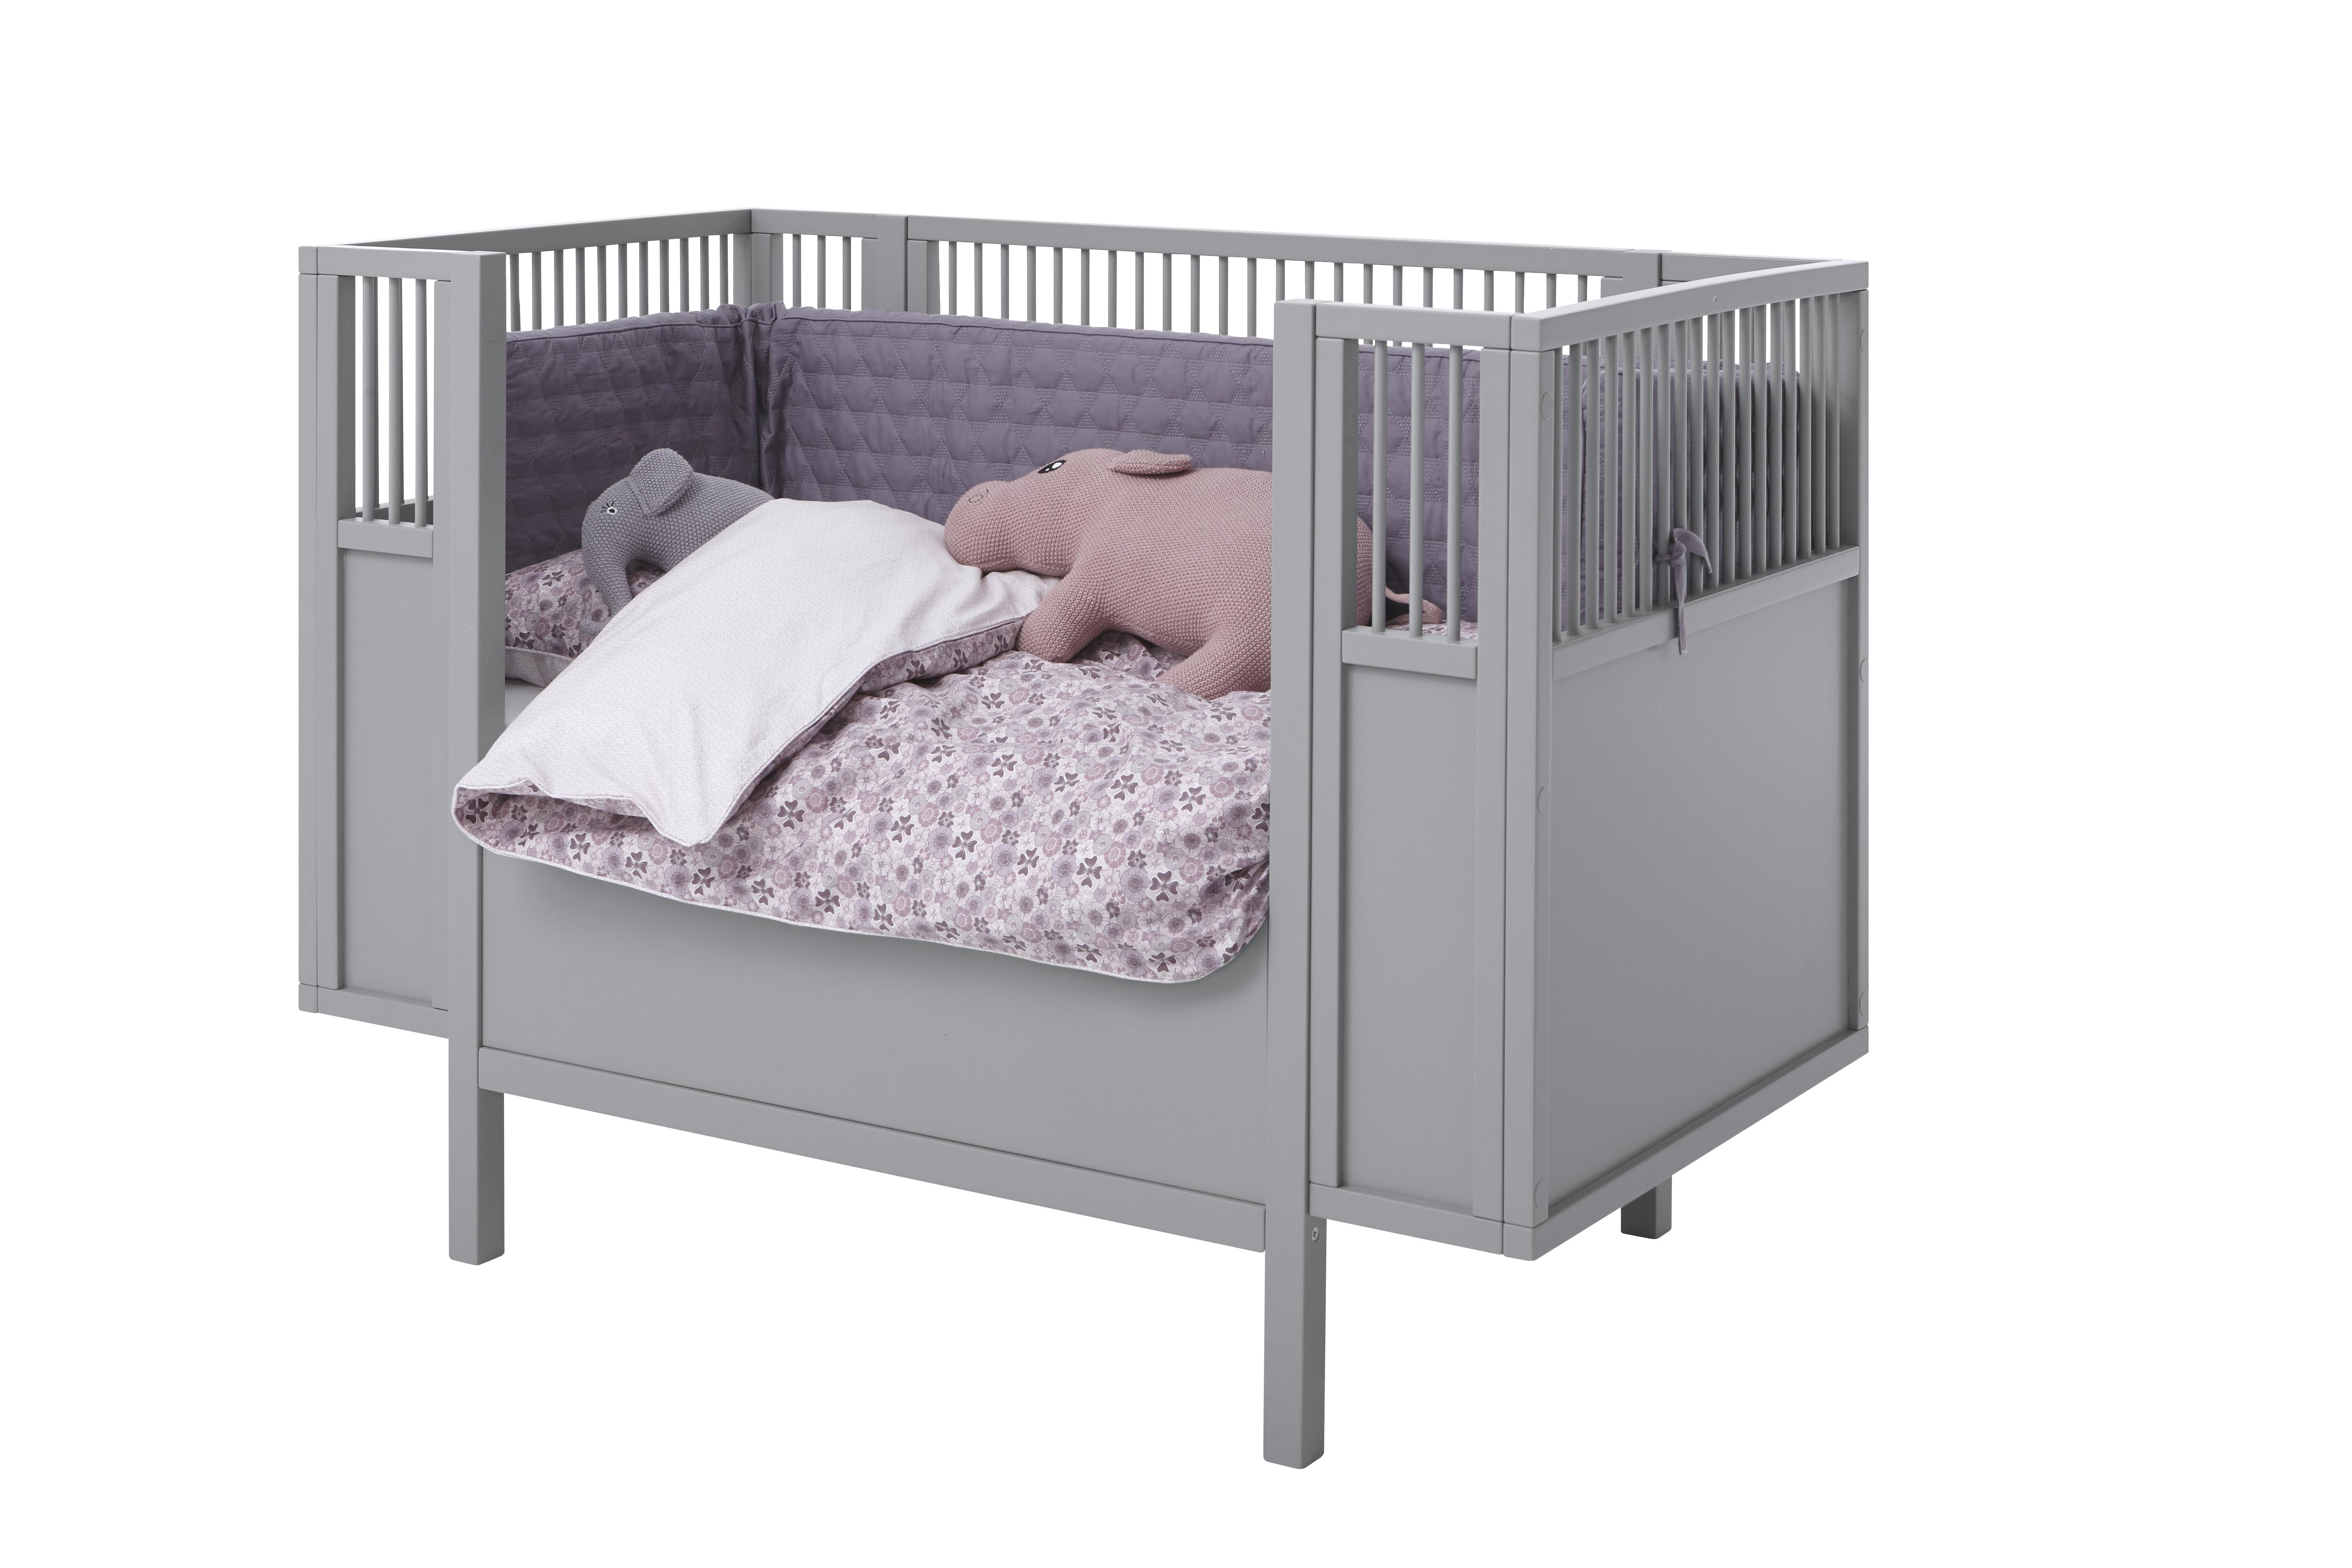 Buy Smallstuff - Rosaline Baby Bed 60 x 120 cm - Grey